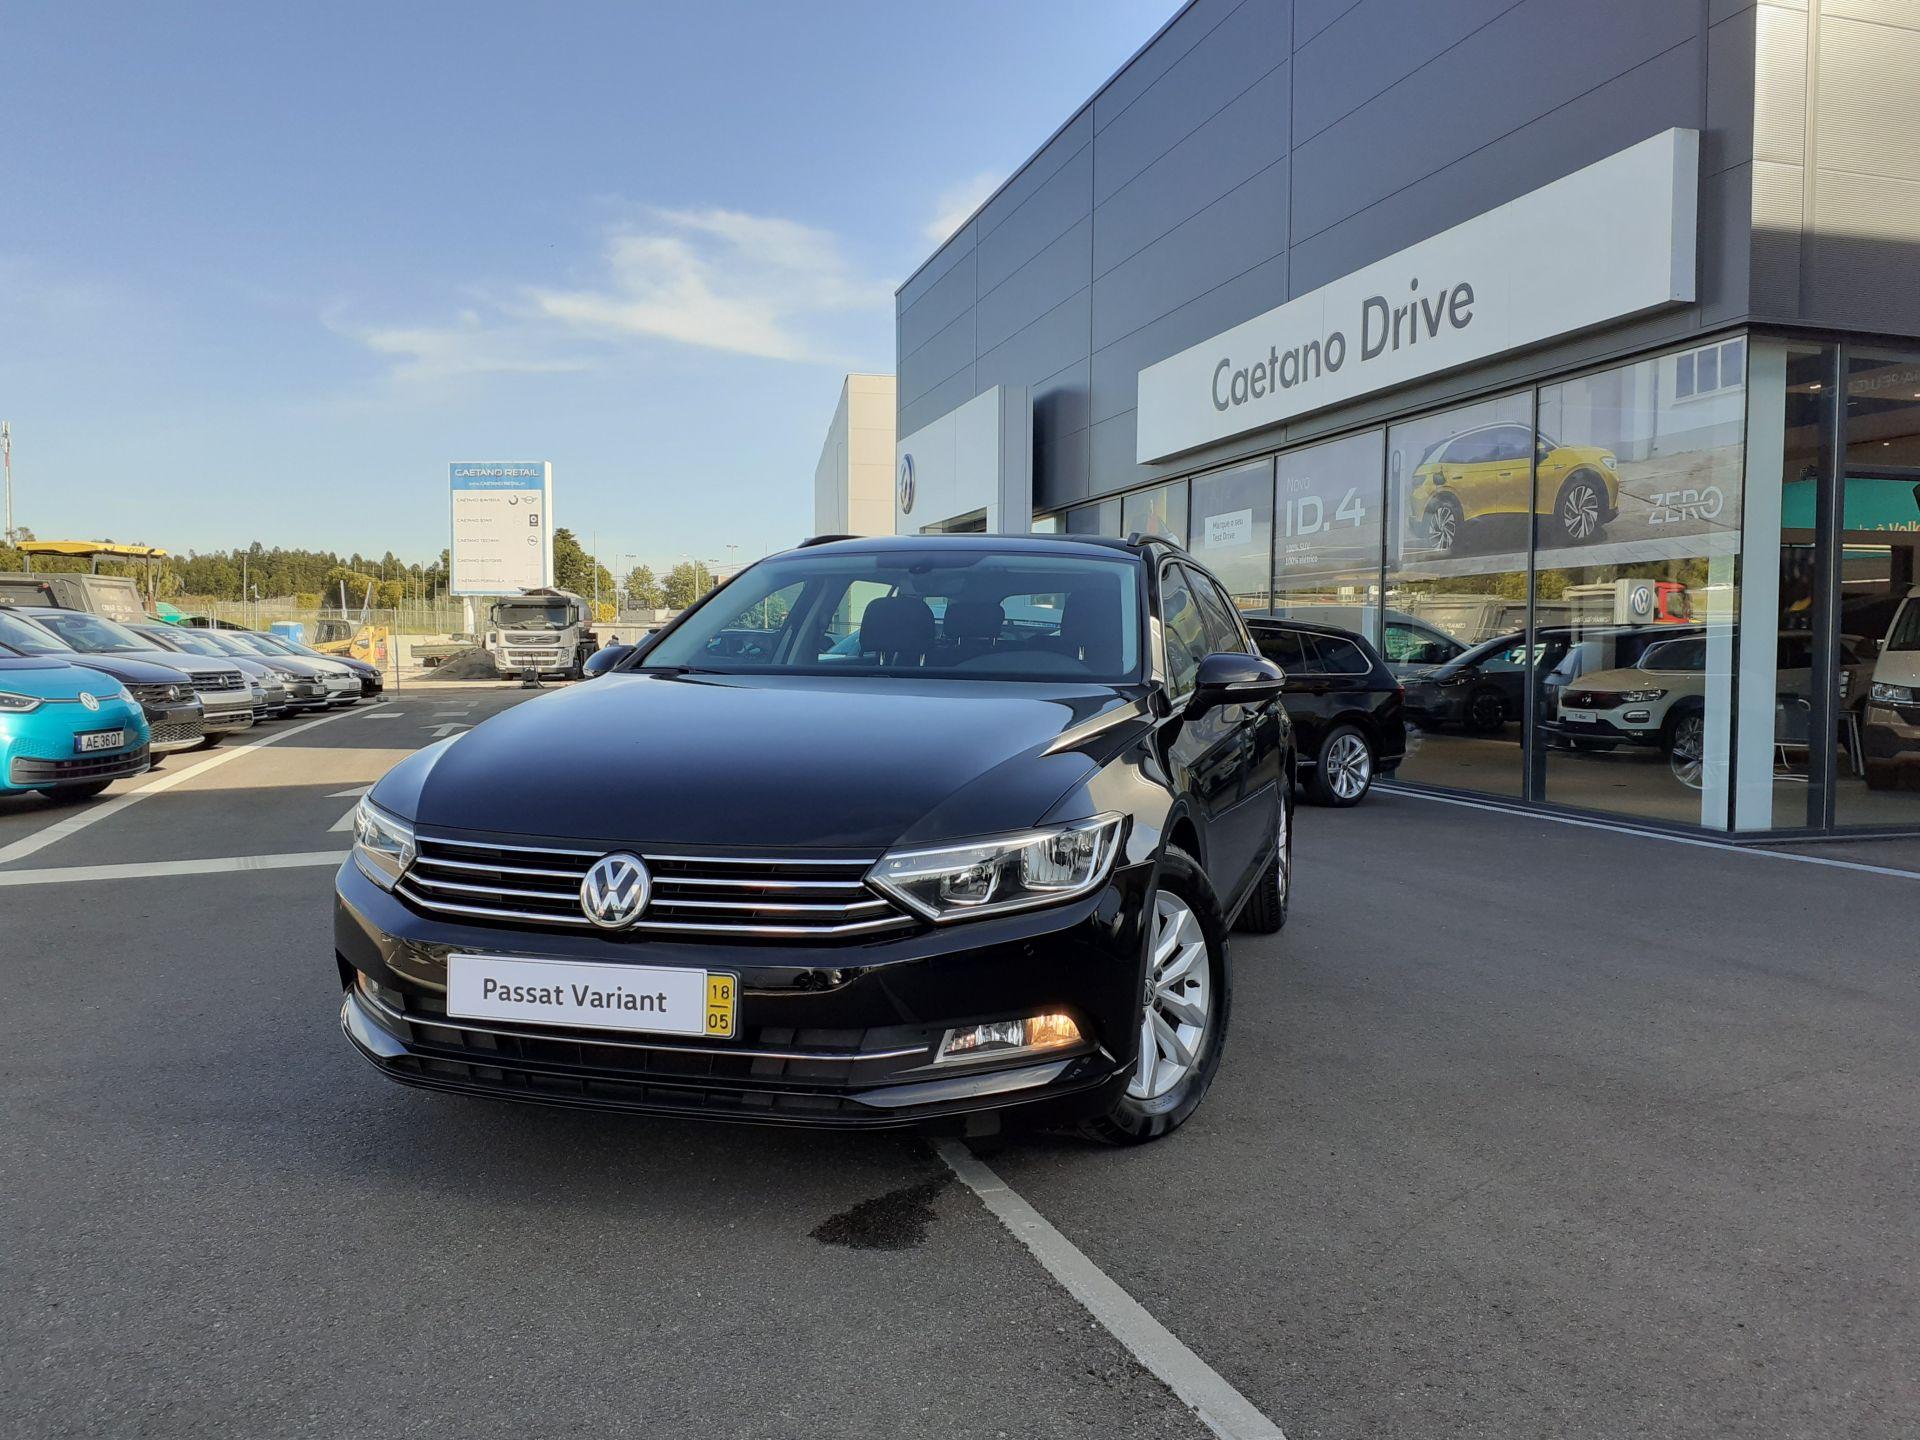 Volkswagen Passat 1.6 TDI CONFORTLINE VARIANT usada Porto